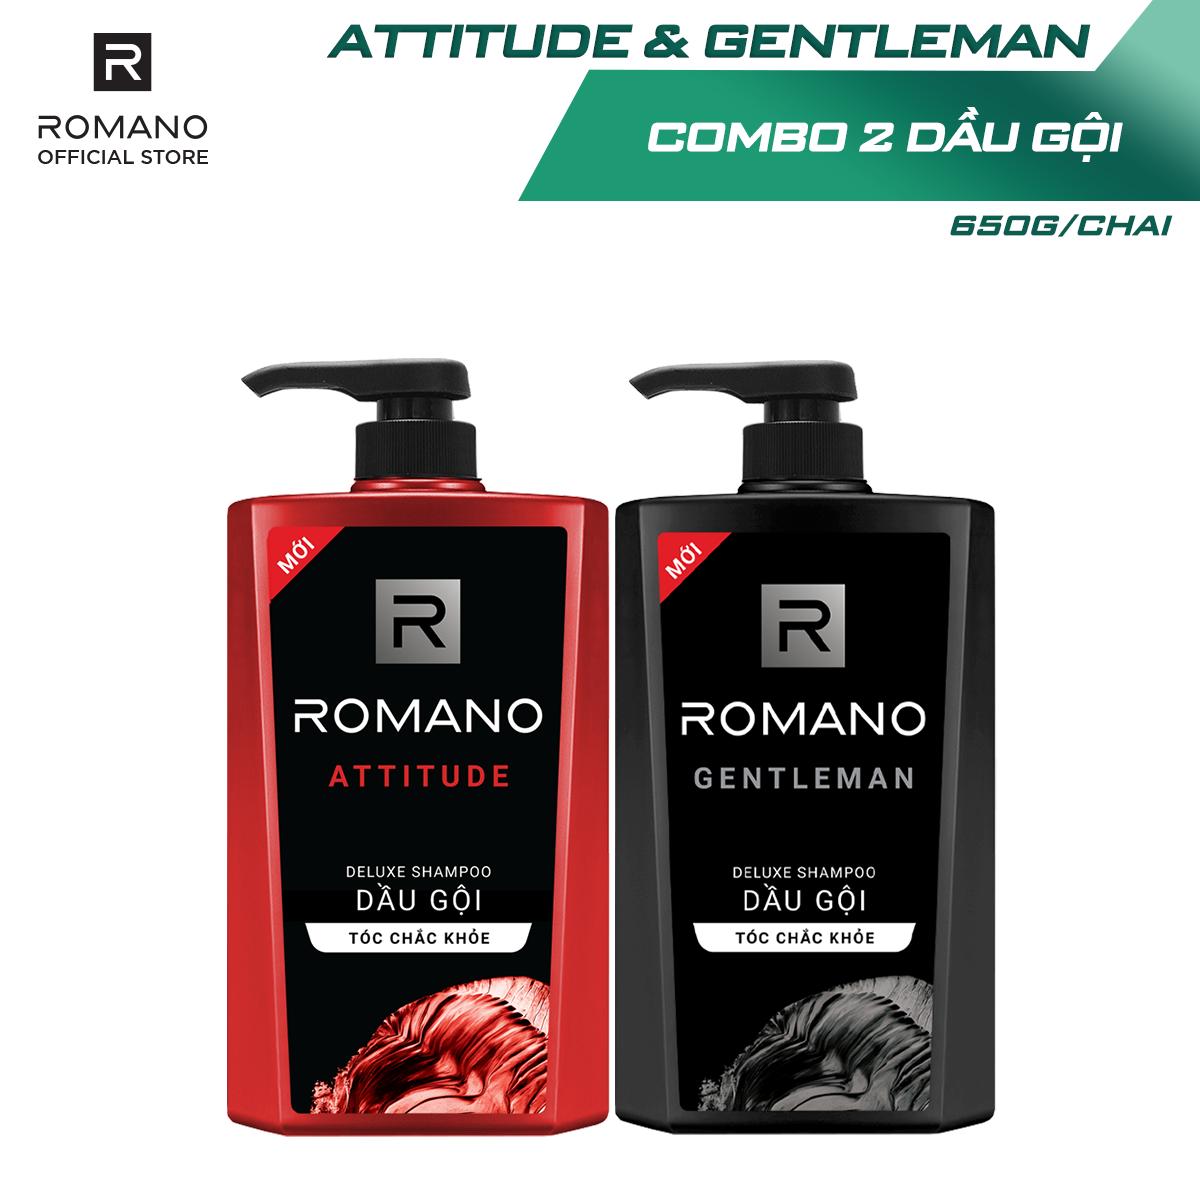 Combo Dầu gội Romano Attitude 650gr và Dầu gội Gentleman 650gr